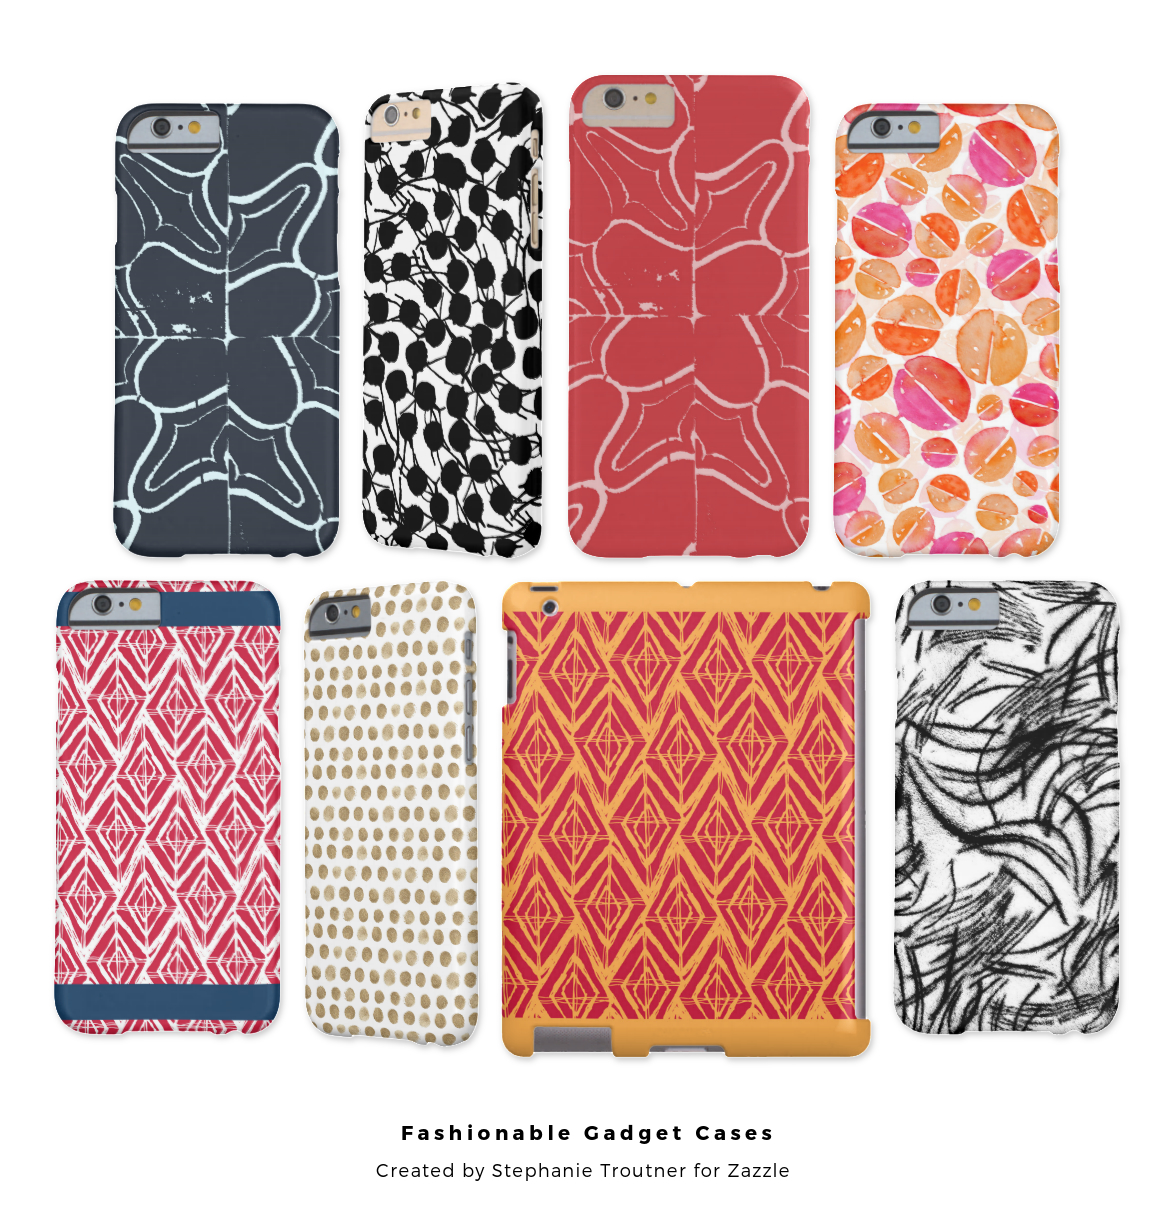 Pretty Gadget Cases